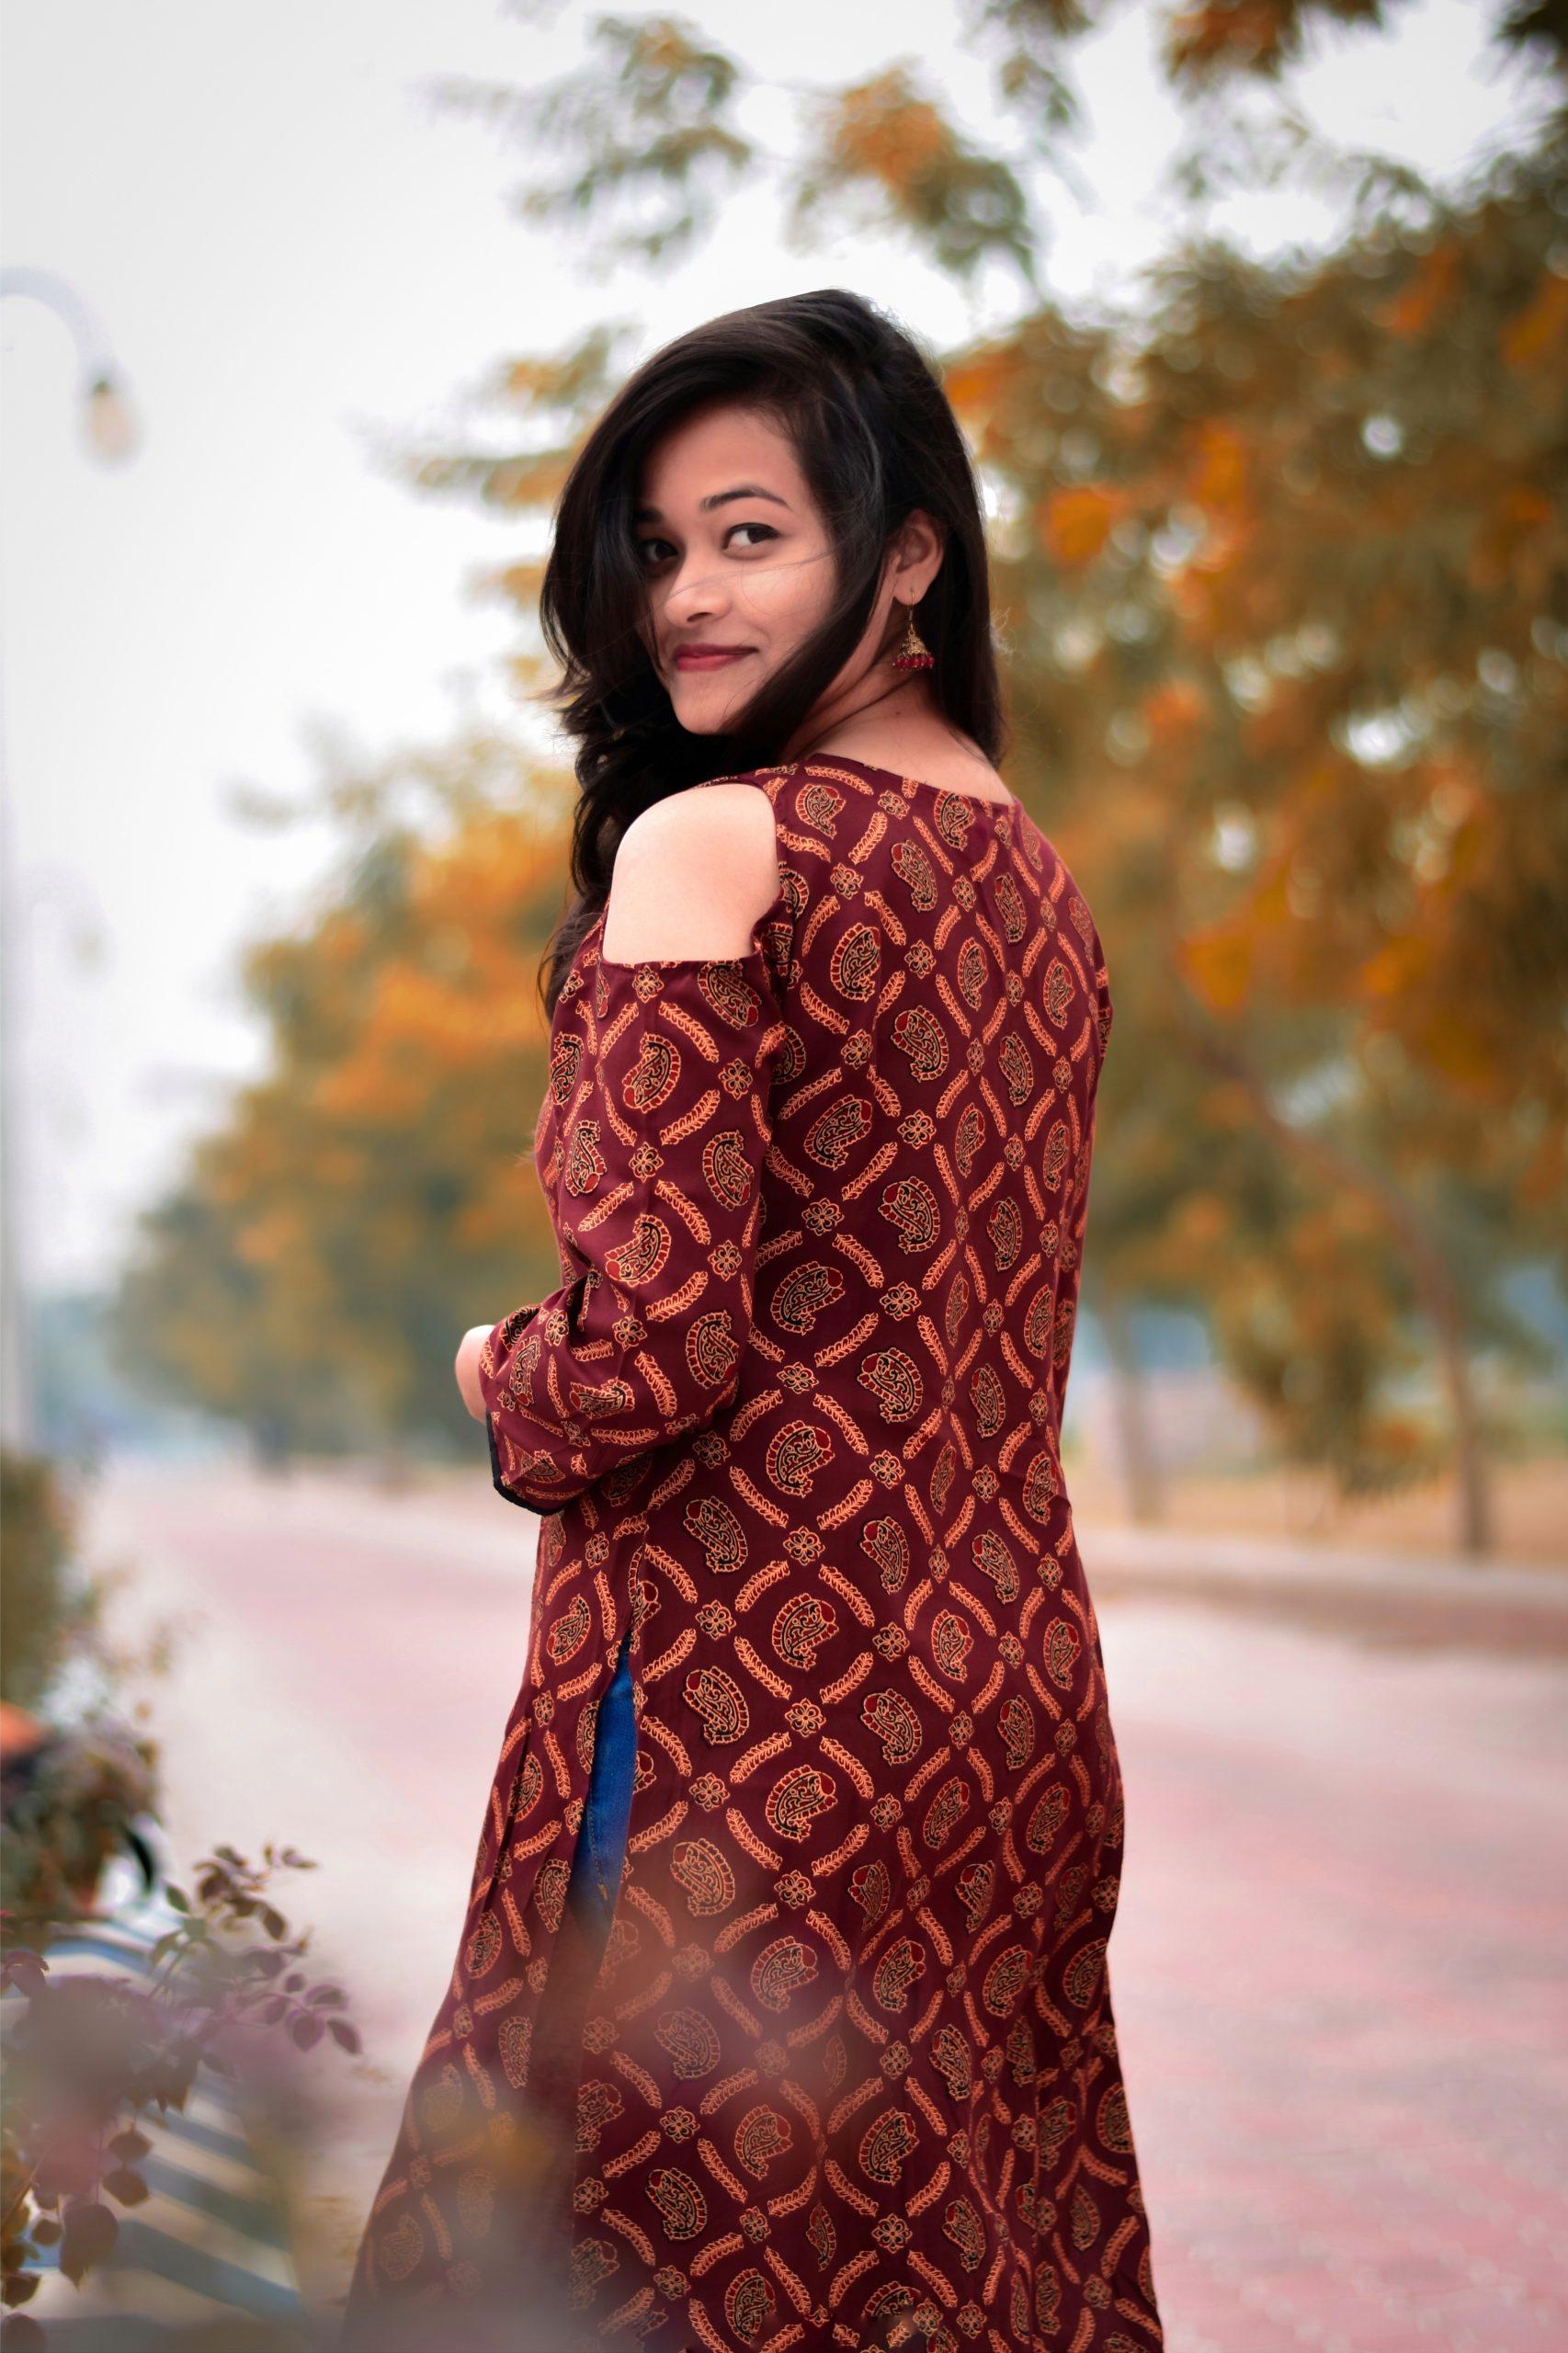 A girl in salwar suit posing